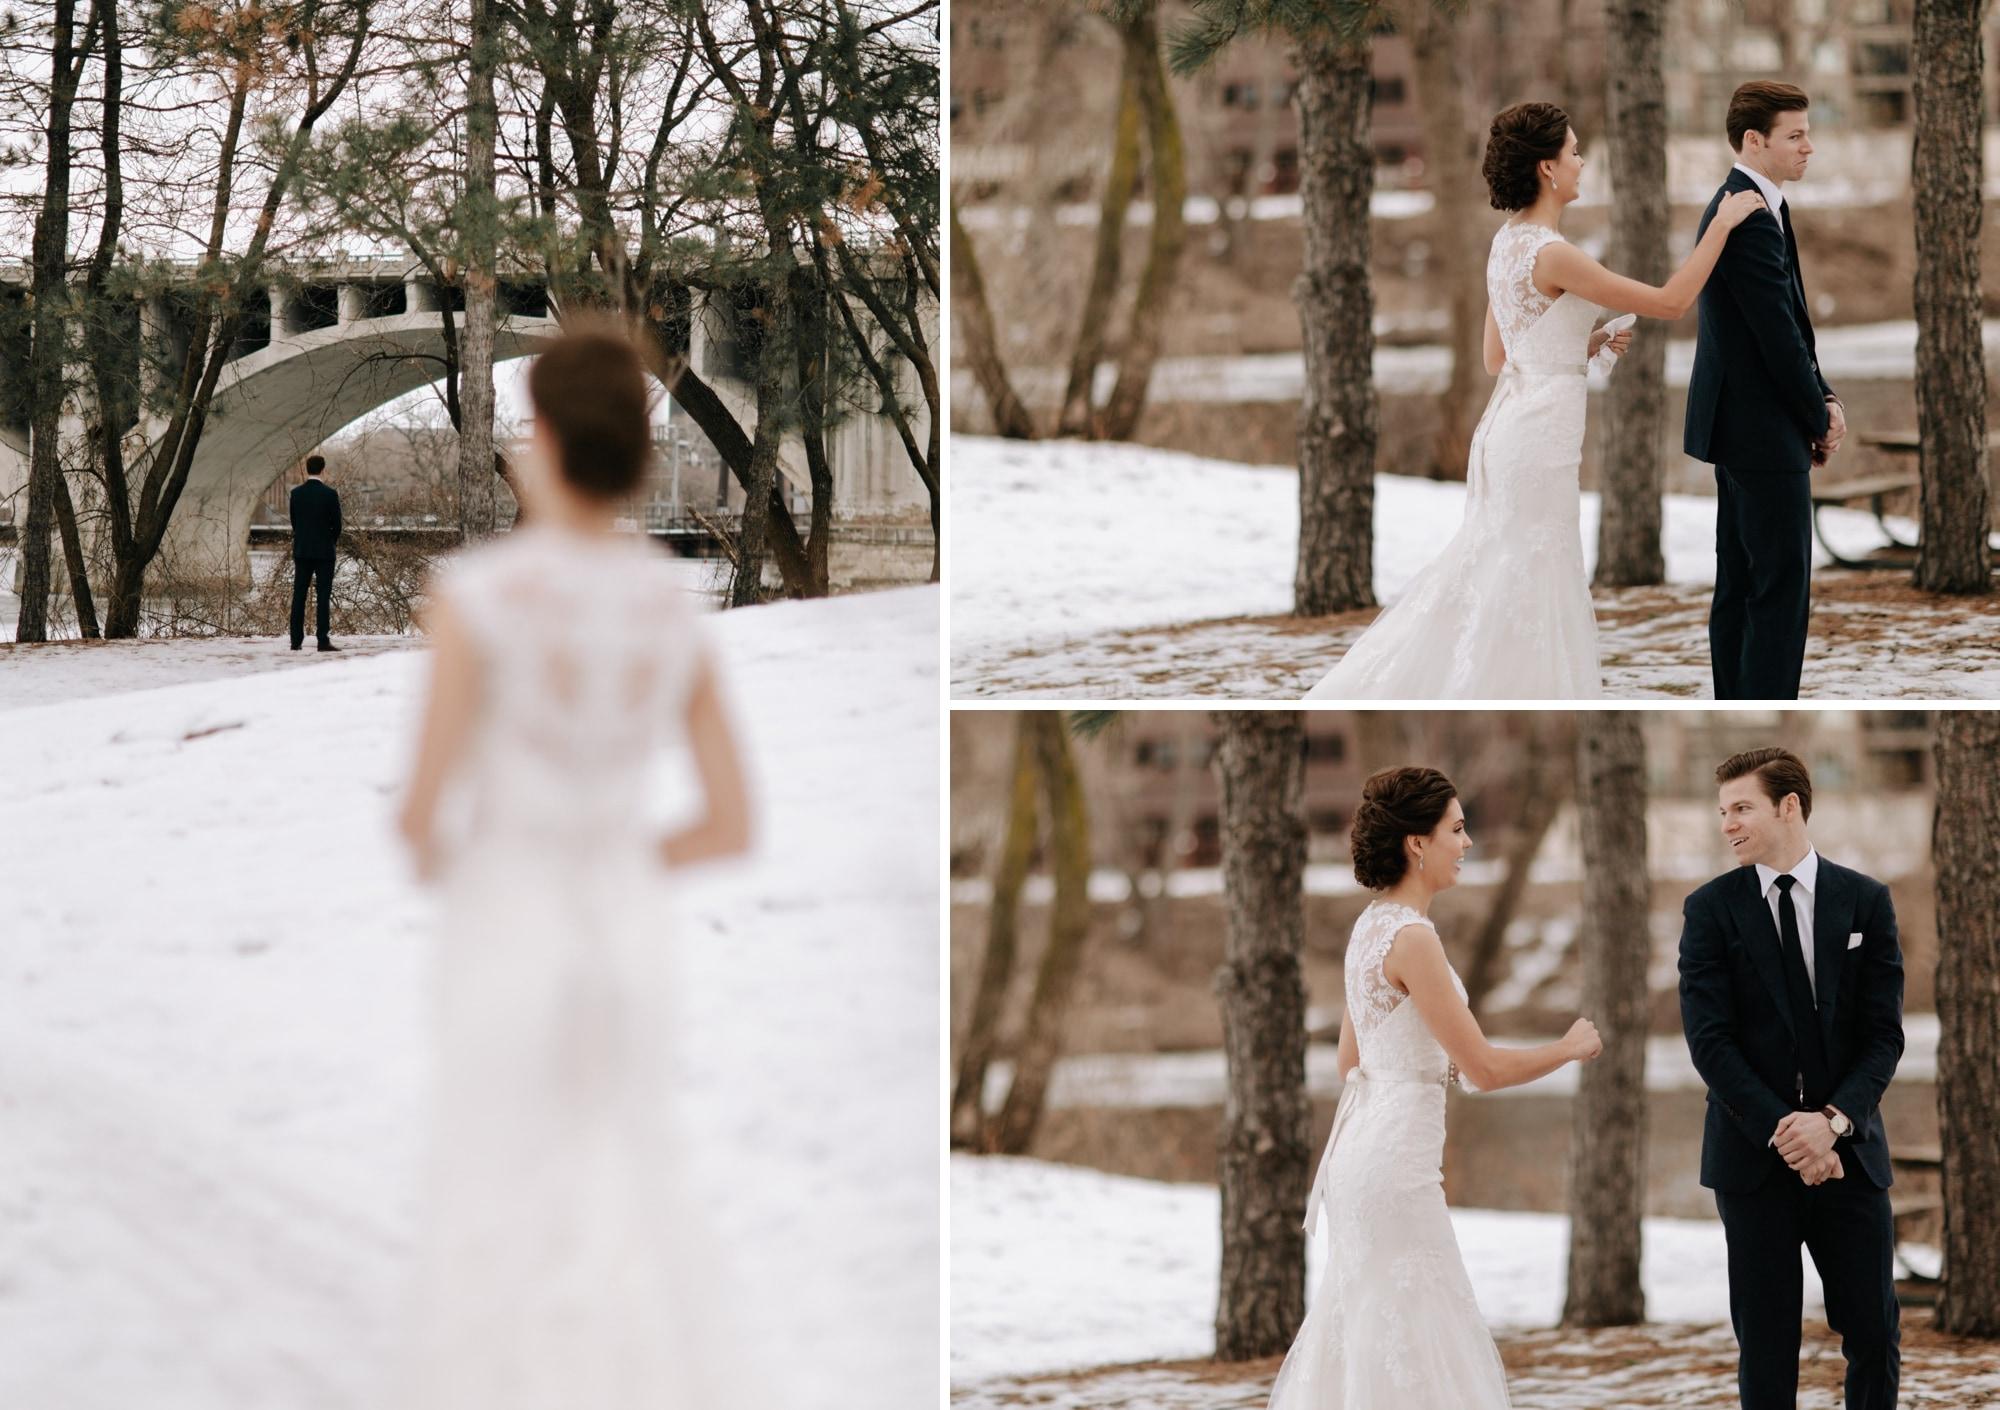 Nicollet-Island-Pavilion-Winter-Wedding-Minneapolis_16.jpg